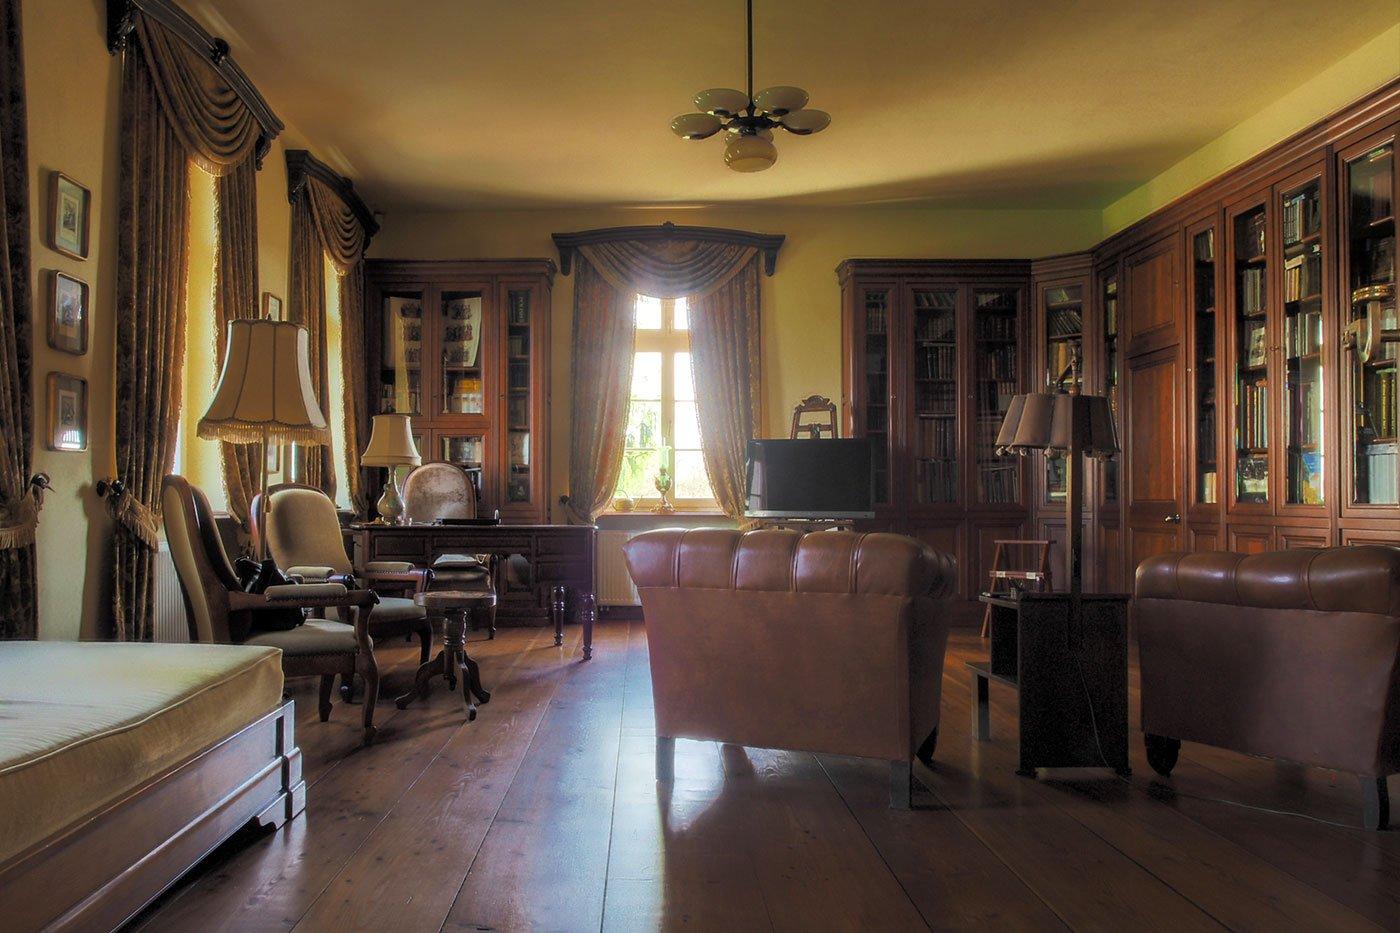 Bibliothek Gut Allmoyen